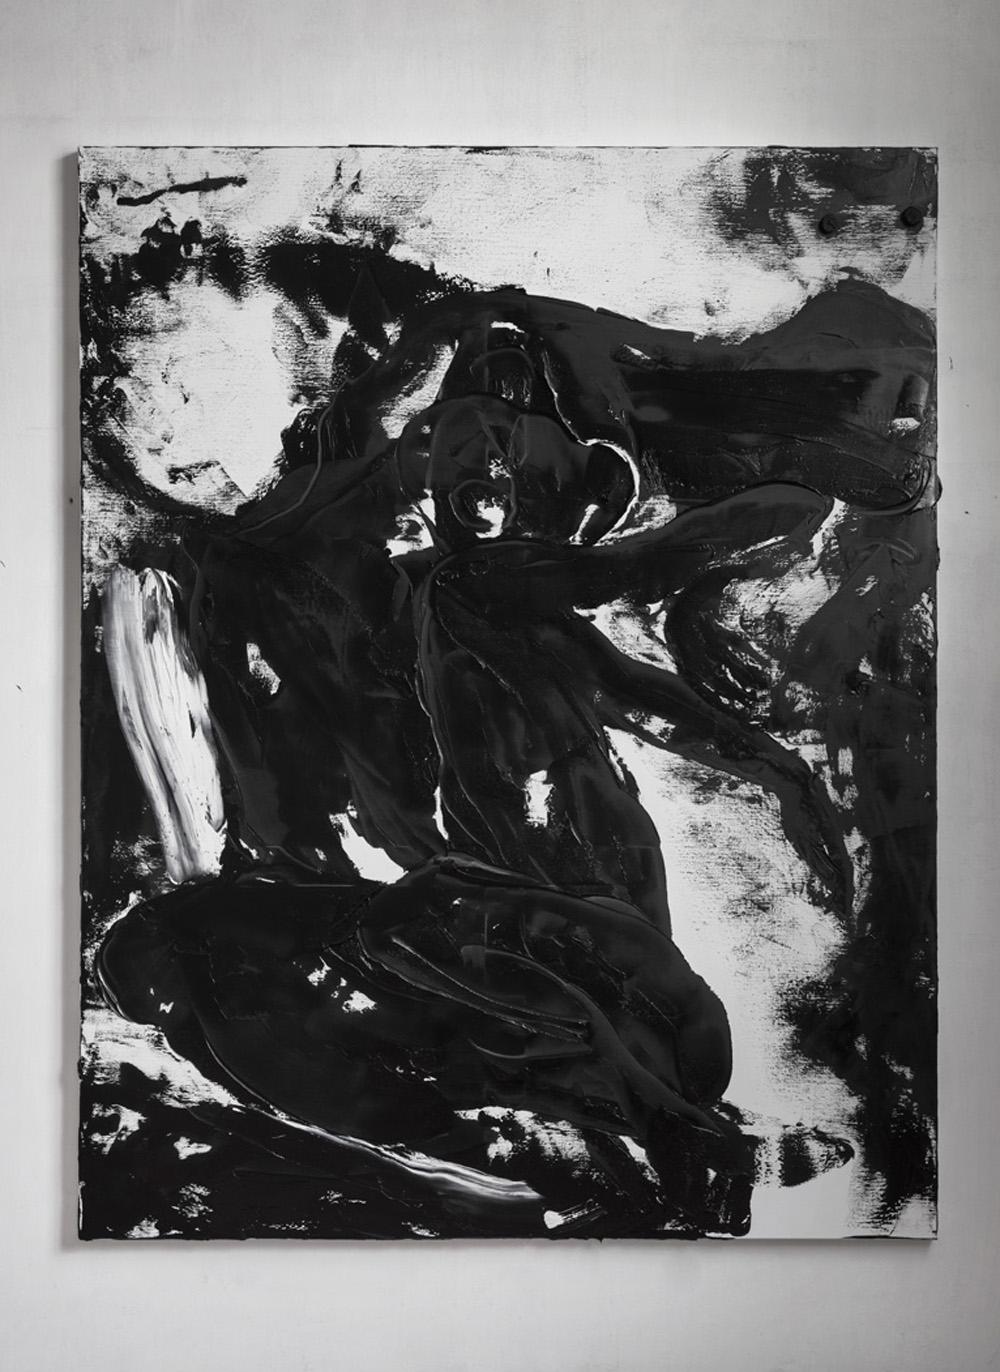 Conversation piece XI, 2017, olio su tela, cm 230x180